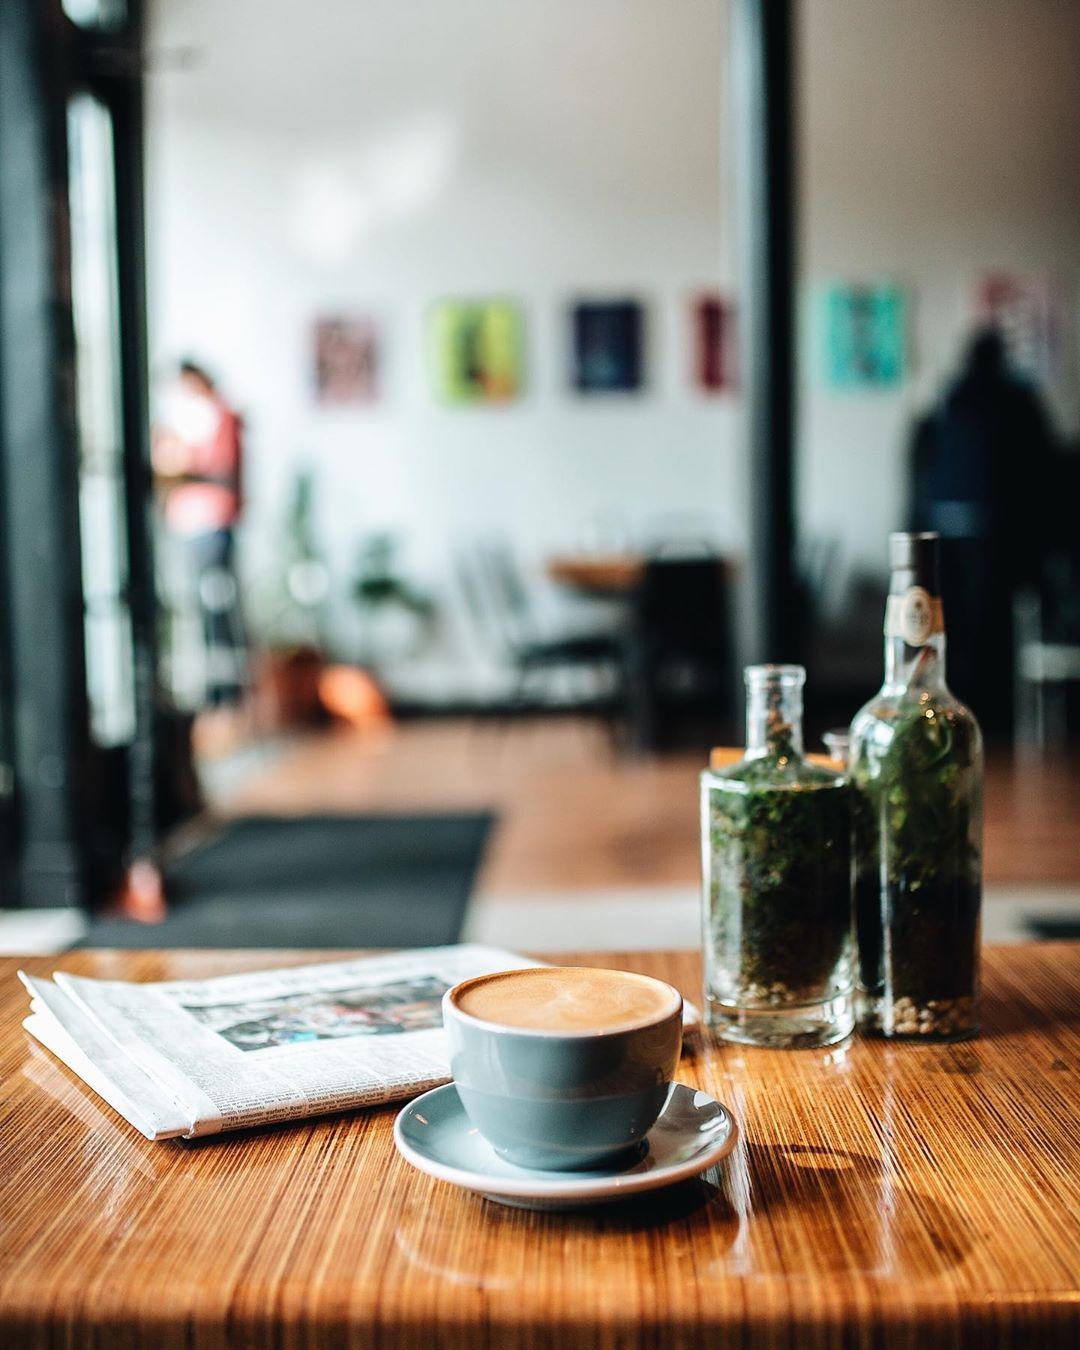 detroit coffee house.jpg